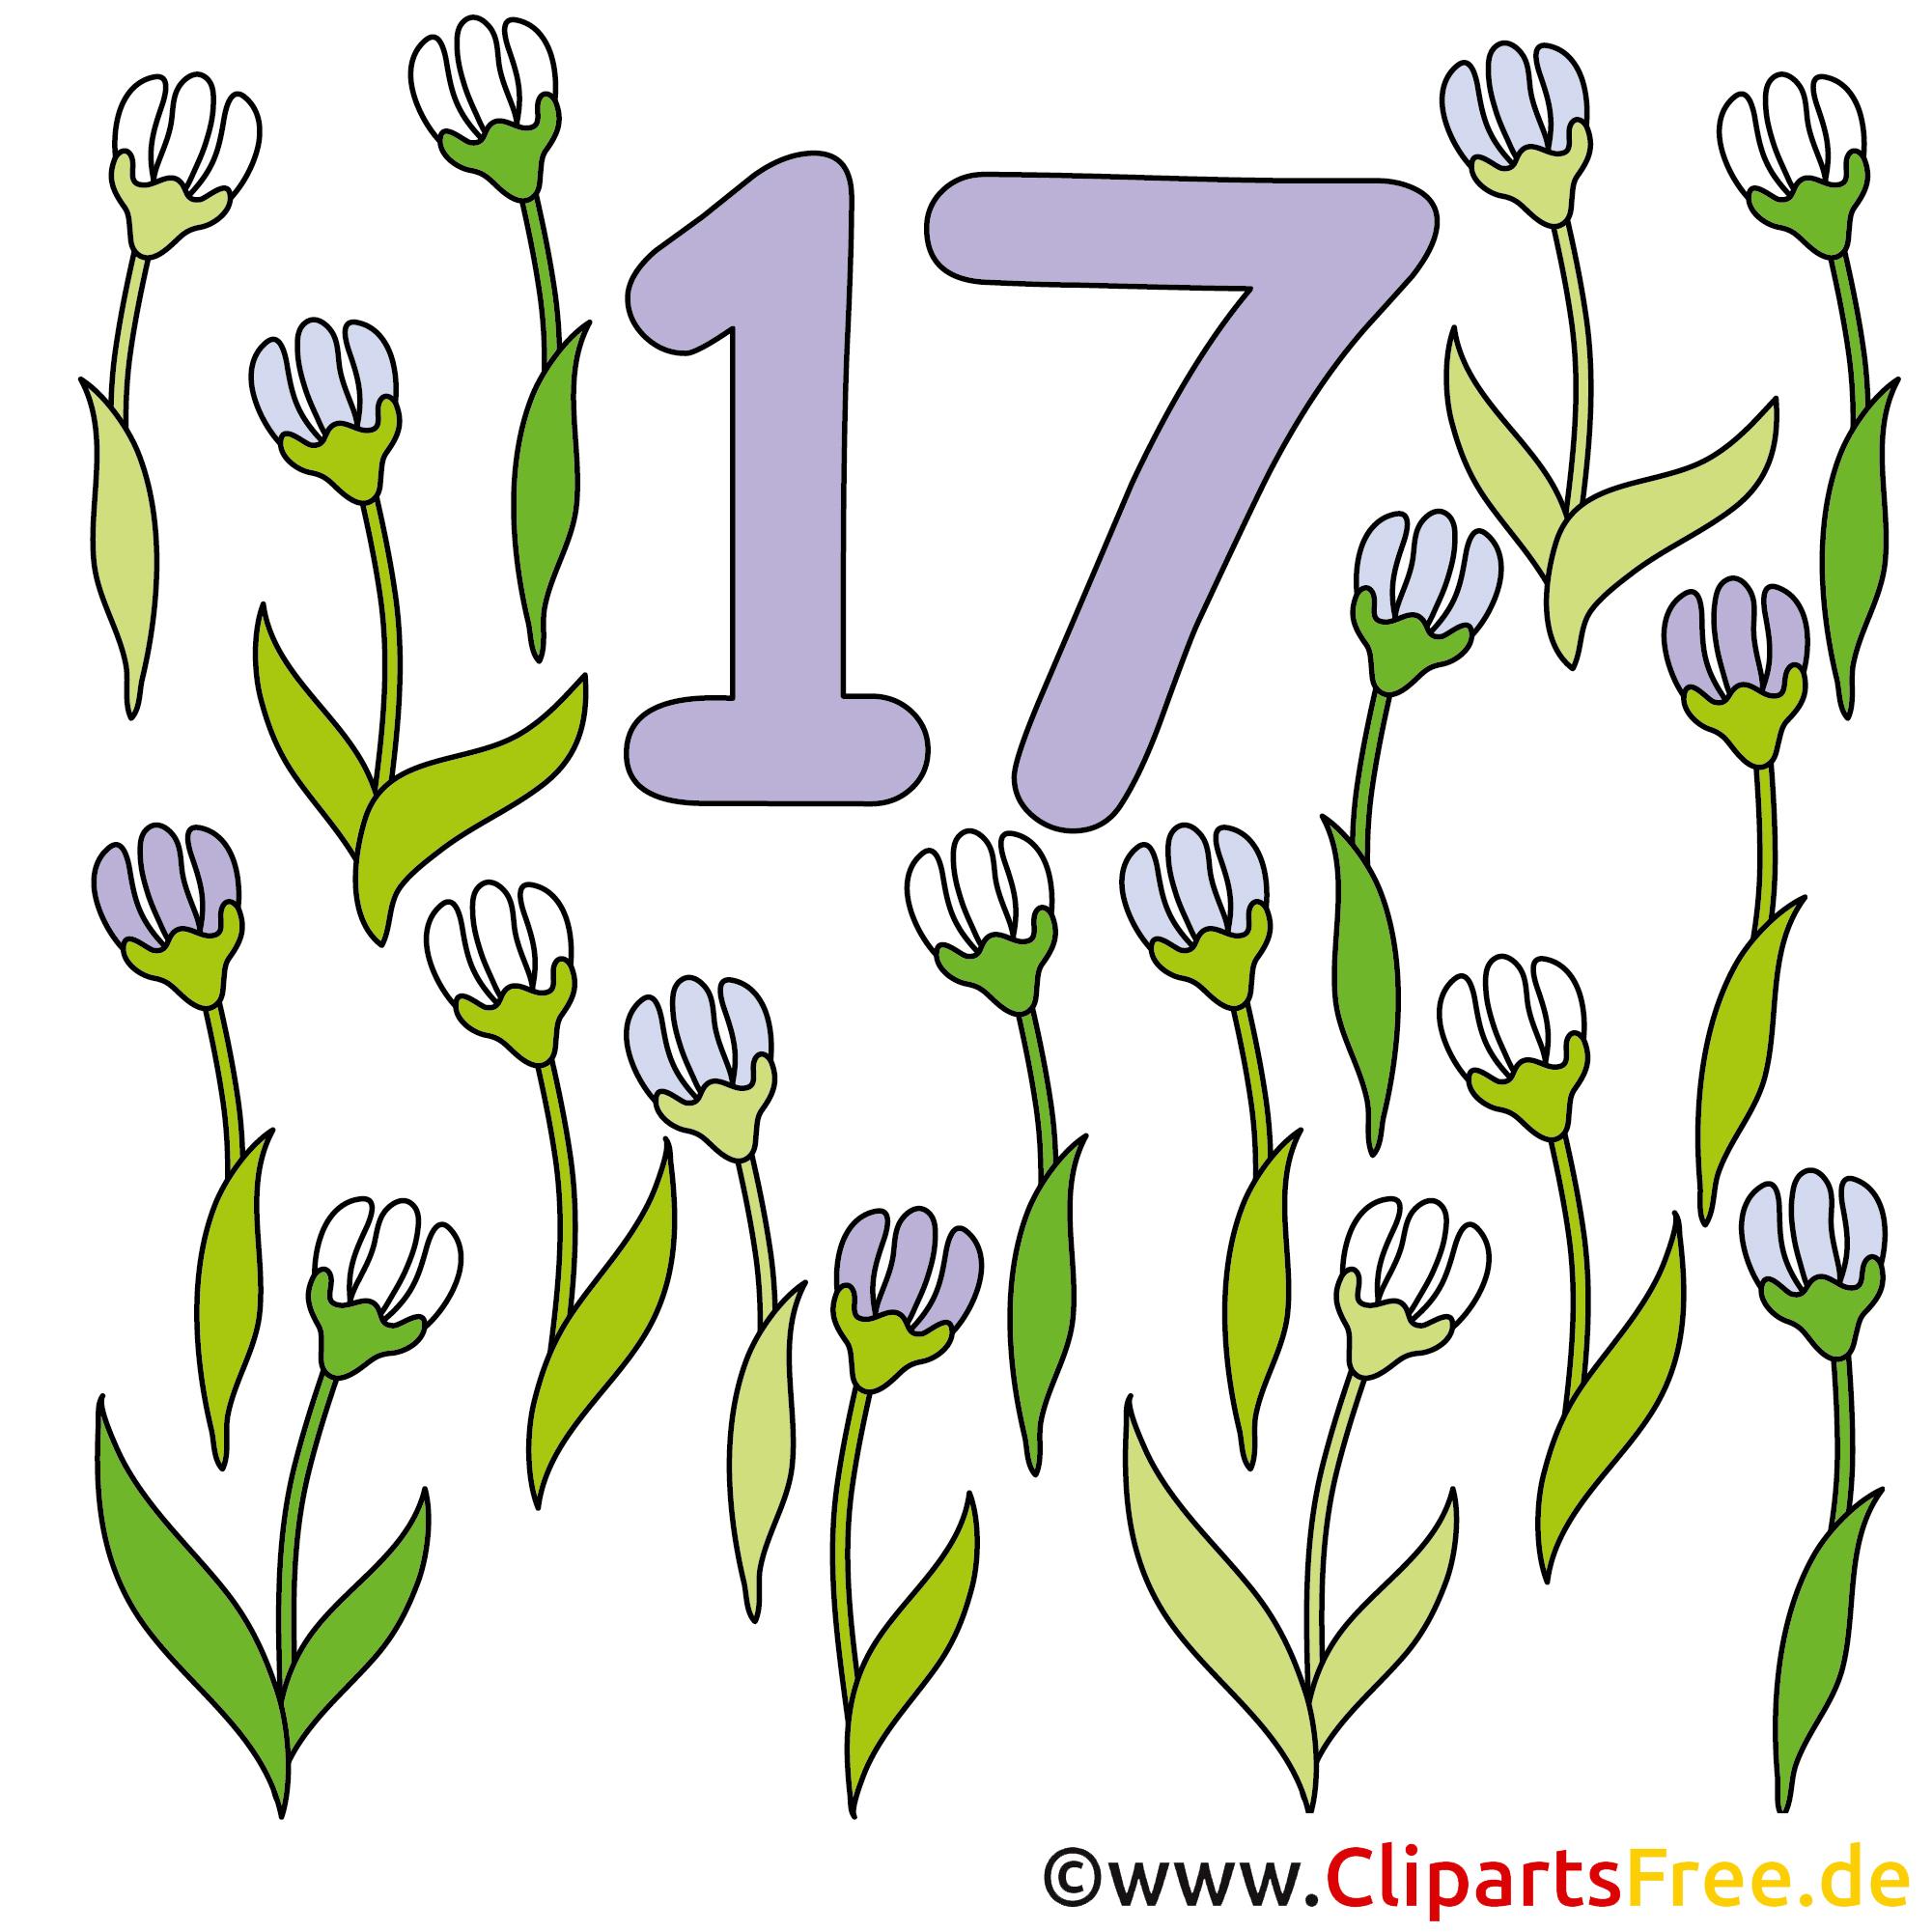 17 - Zahlen Cartoon